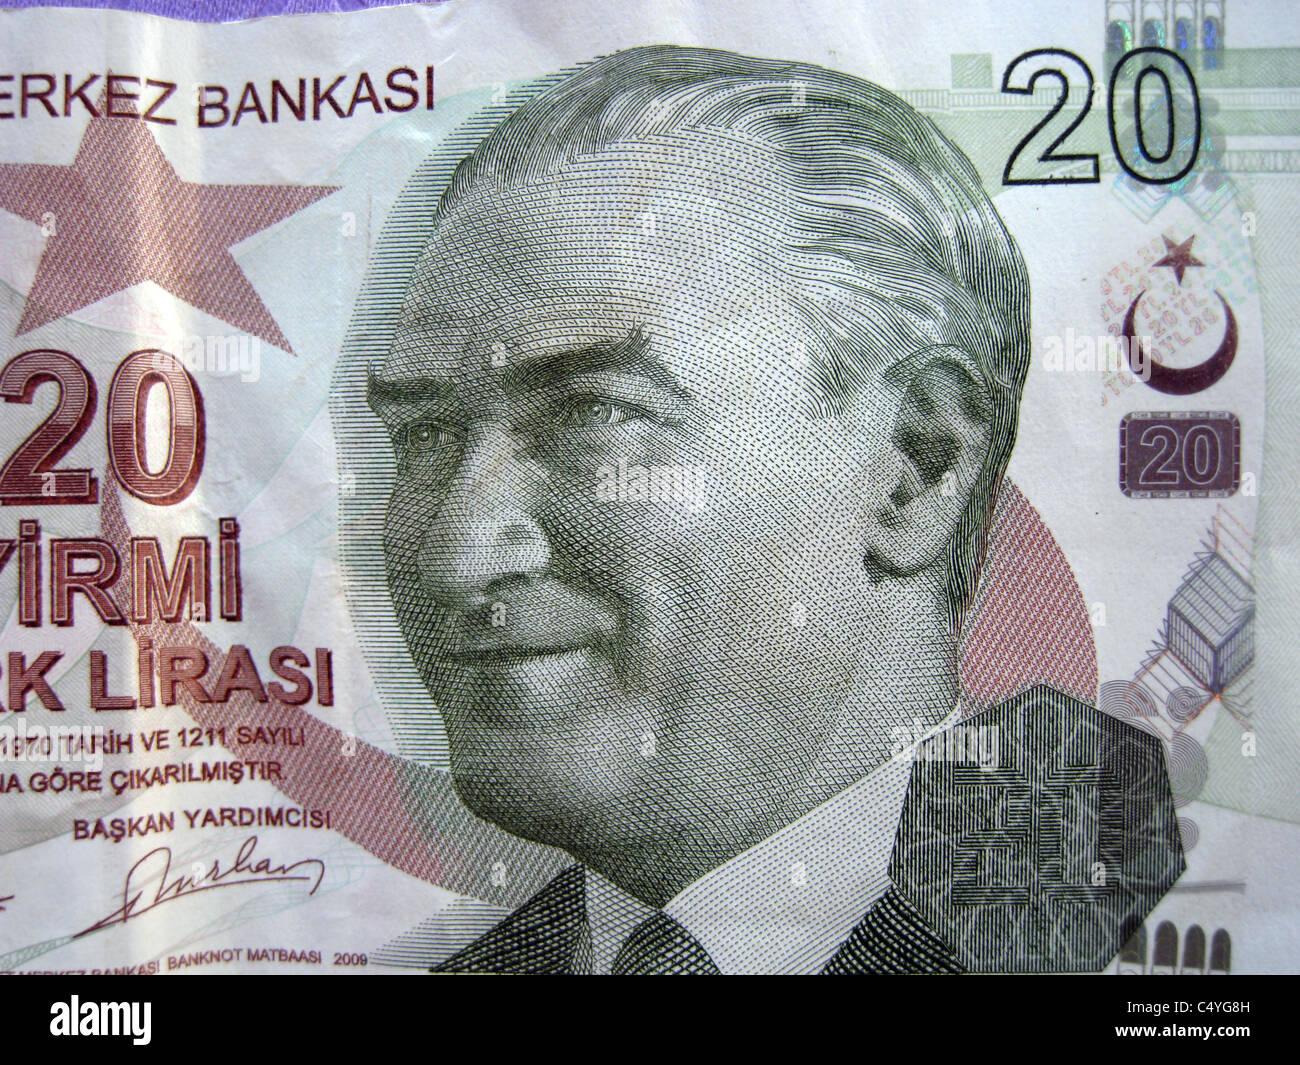 MUSTAFA KEMAL ATATURK (1881-1938) Founder of the Turkish Republic on a 20 Lire banknote - Stock Image